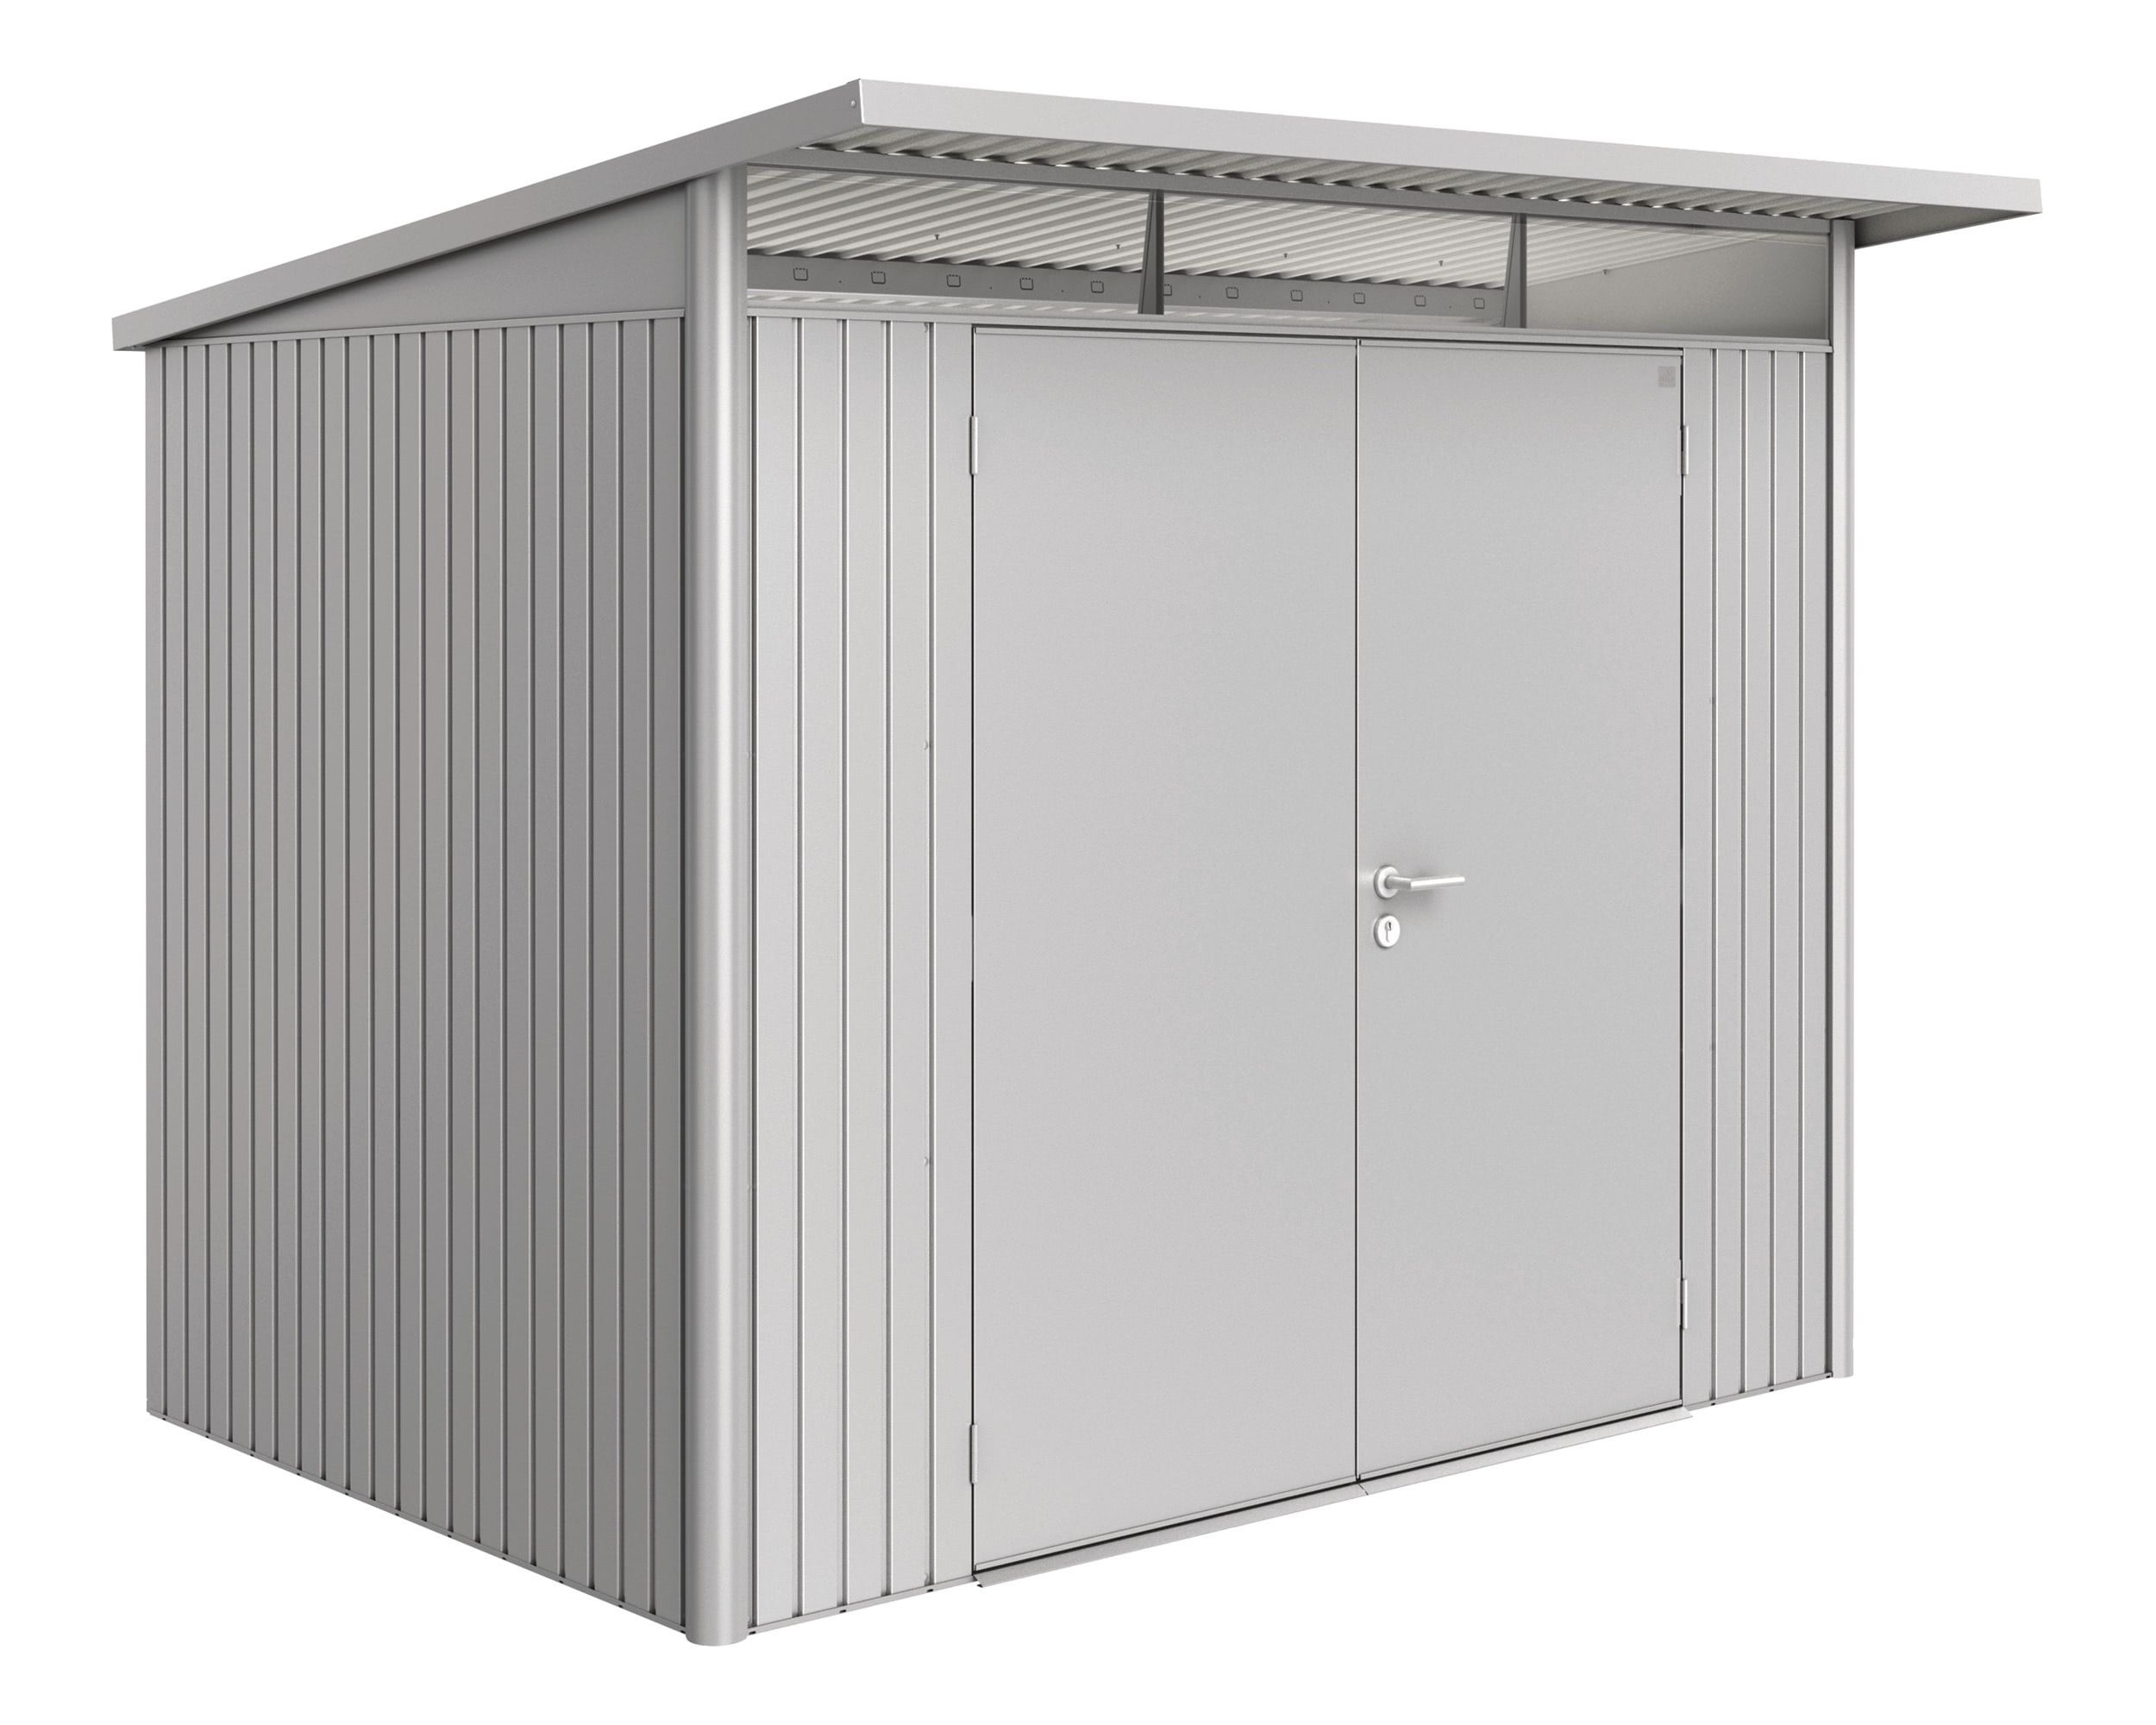 Gerätehaus Avantgarde A5, Doppeltüre